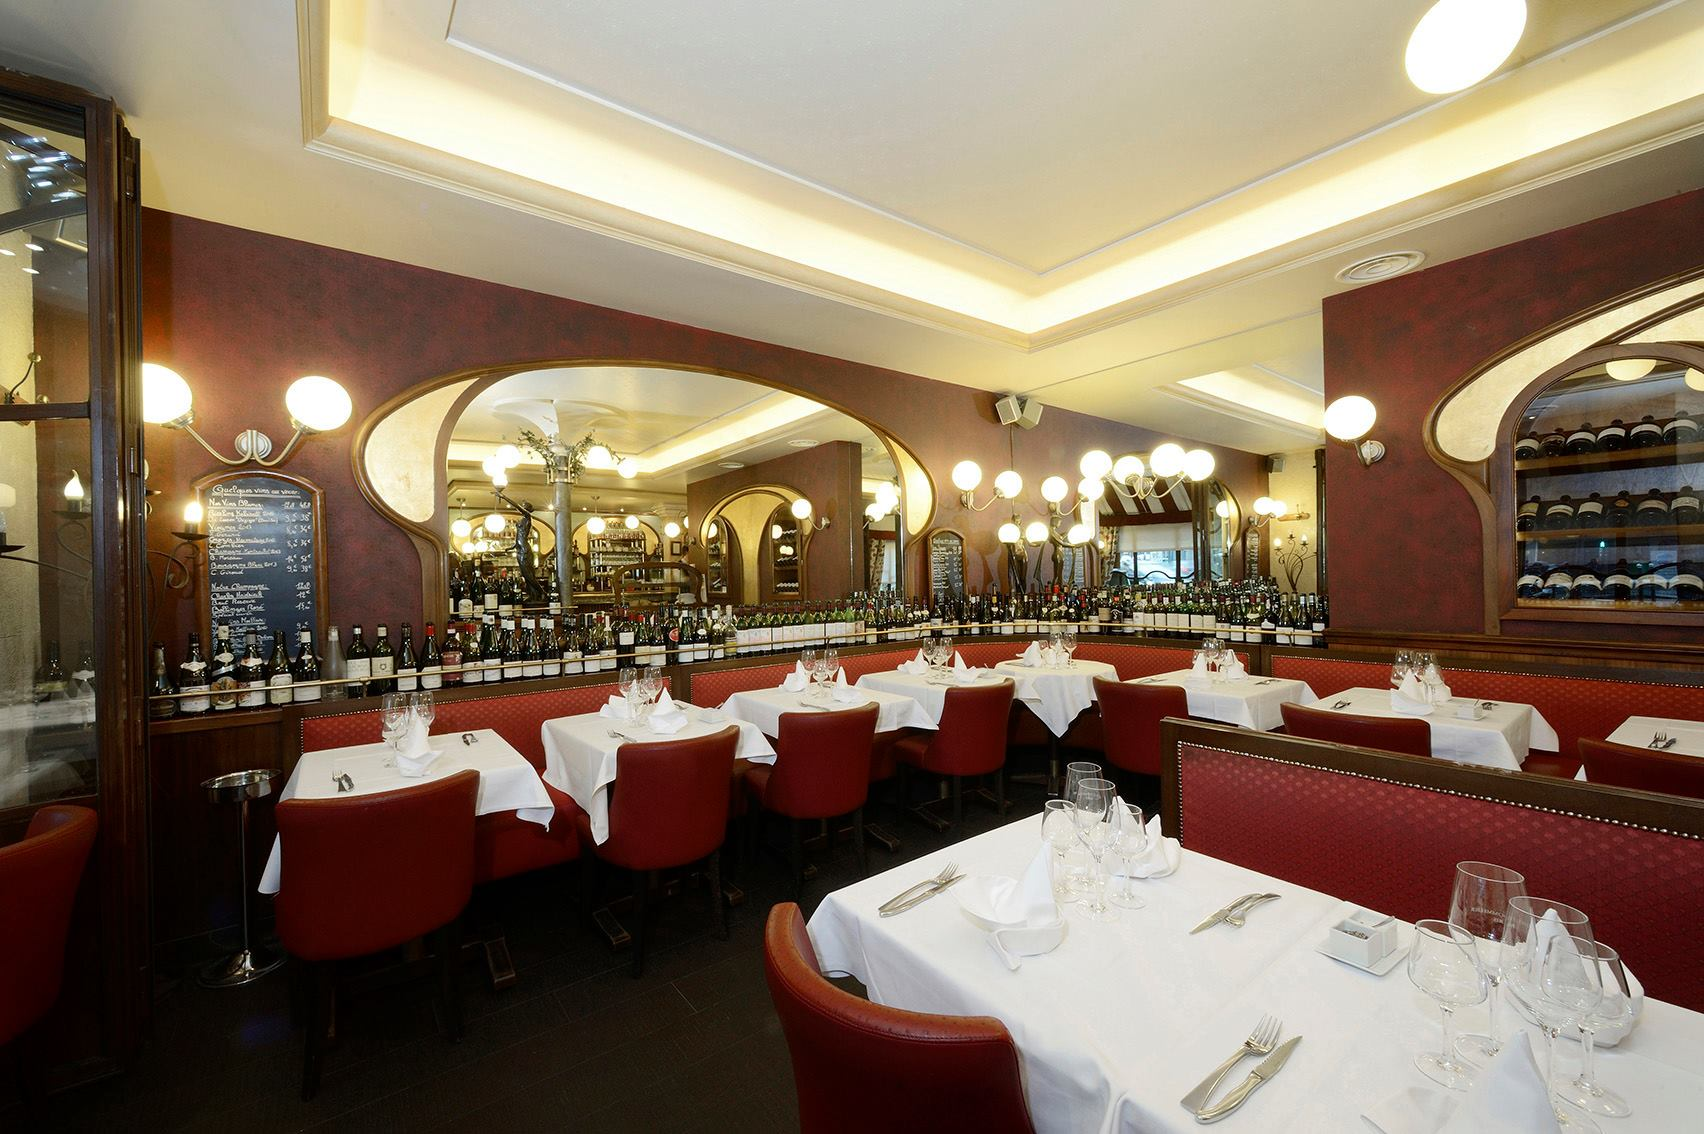 52 Paris Food & Drink Events